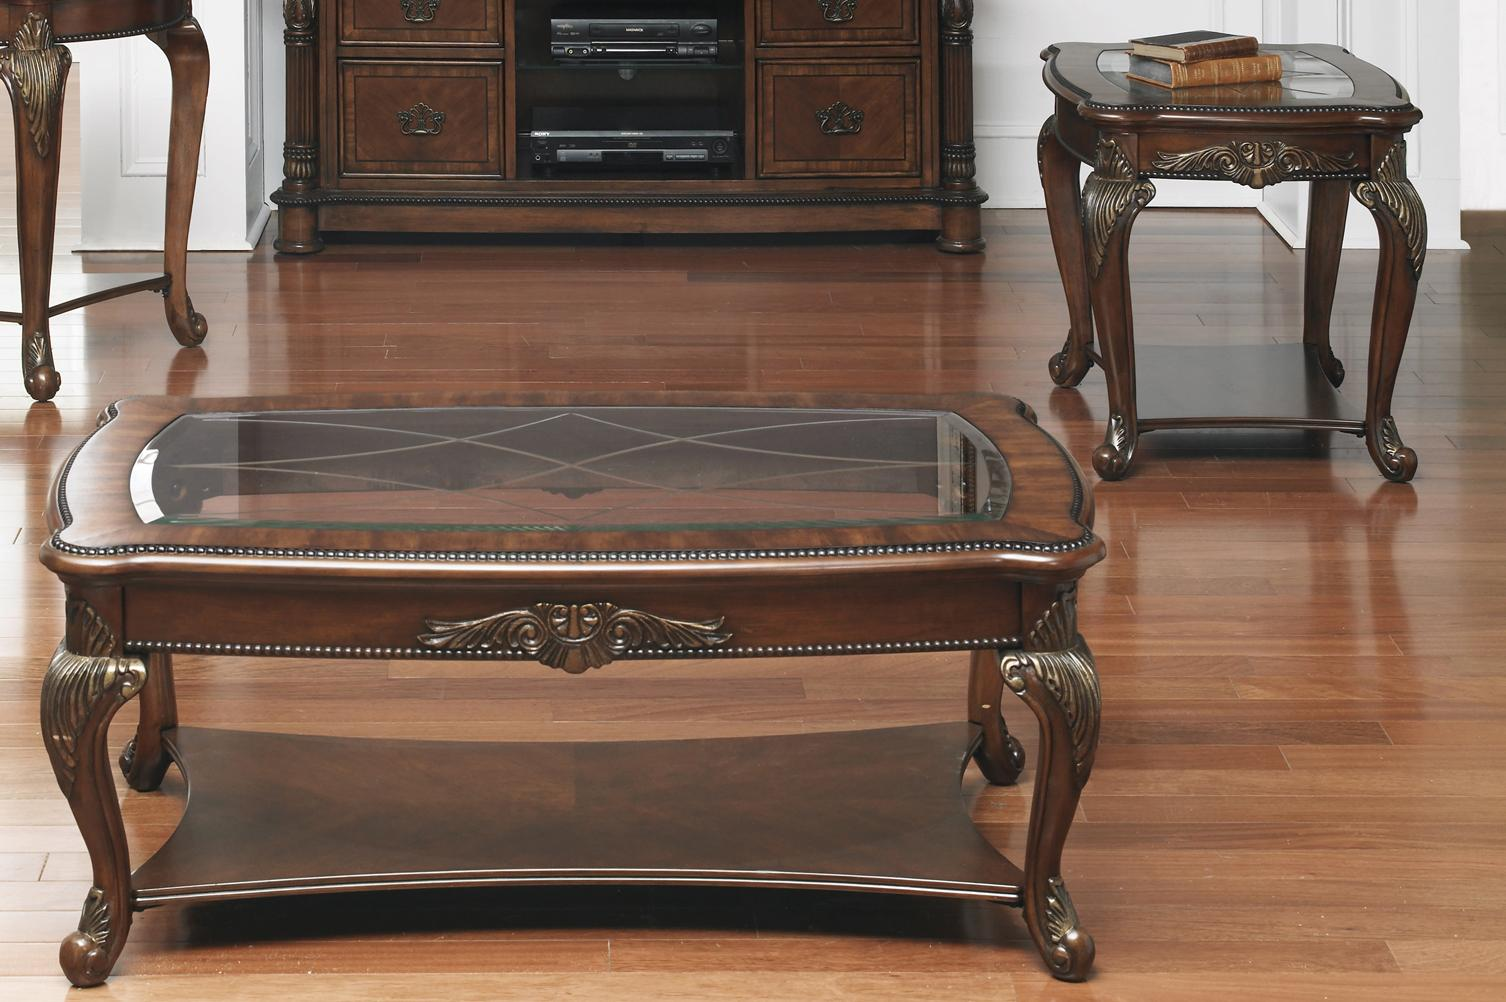 Liberty Furniture Eden Park 3 Piece Occasional Table Set - Item Number: 882-OT1010+2x20